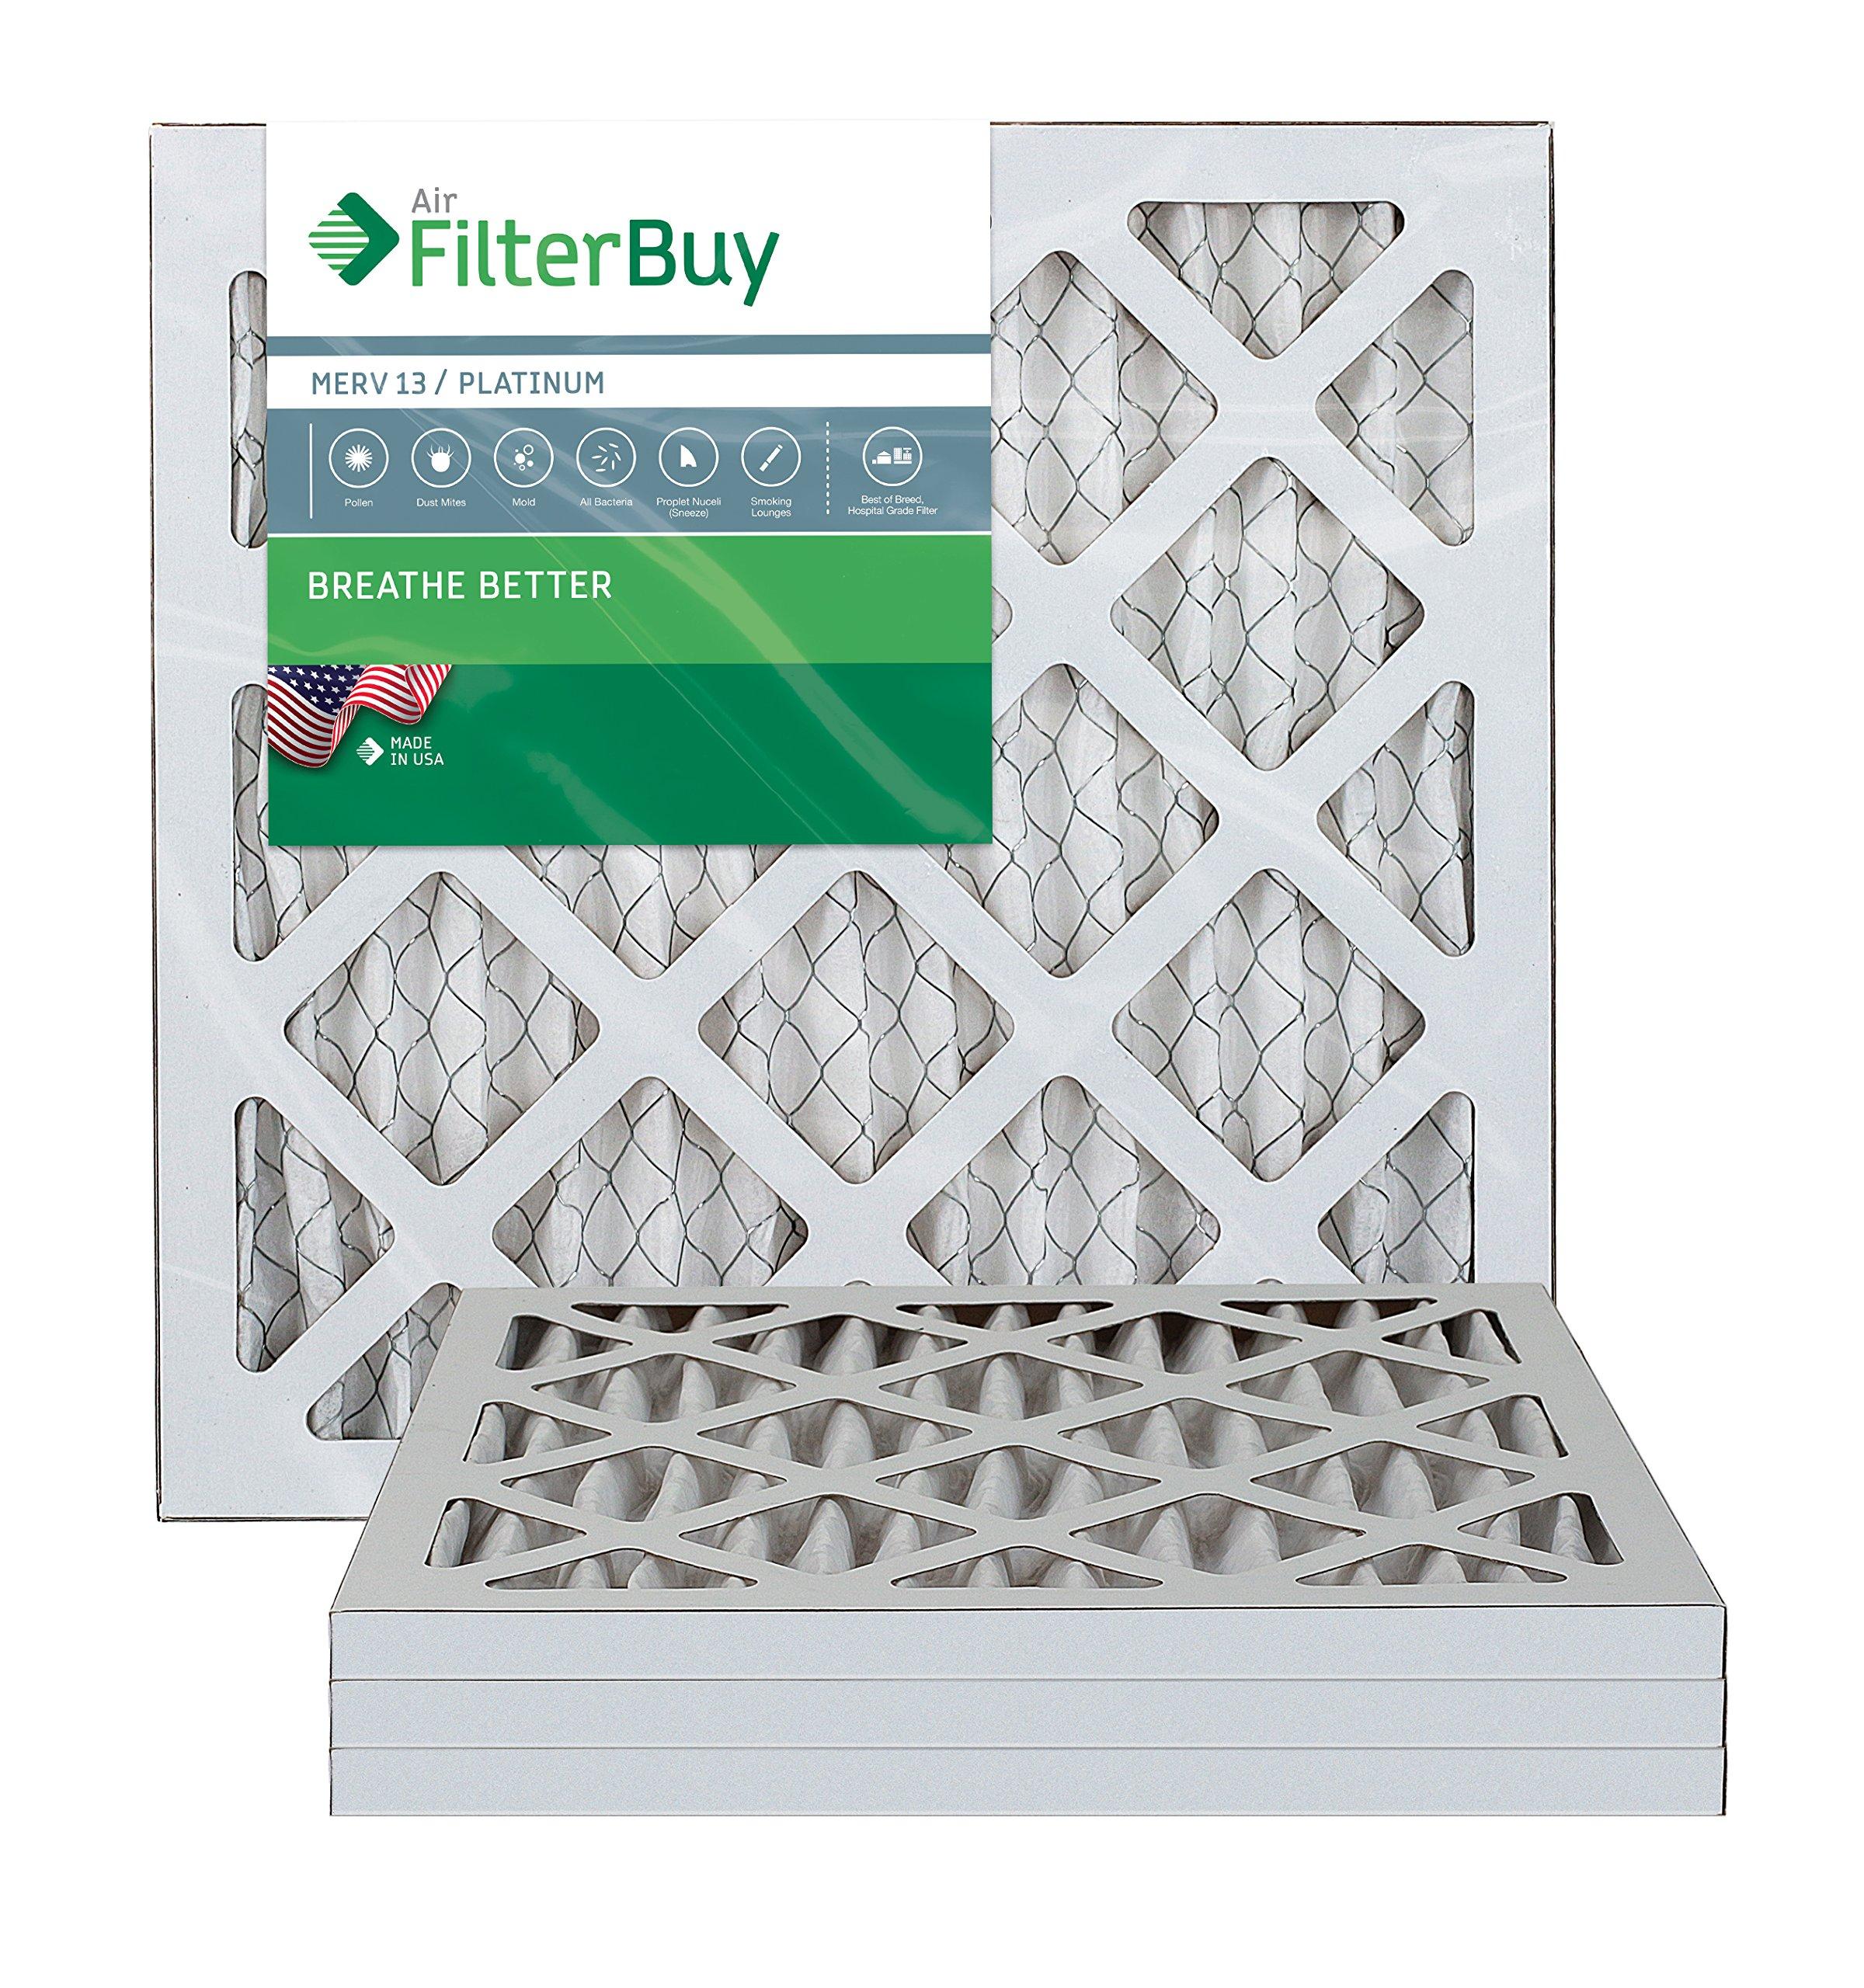 Pack of 2 Filters FilterBuy 30x30x1 MERV 13 Pleated AC Furnace Air Filter, Platinum 30x30x1